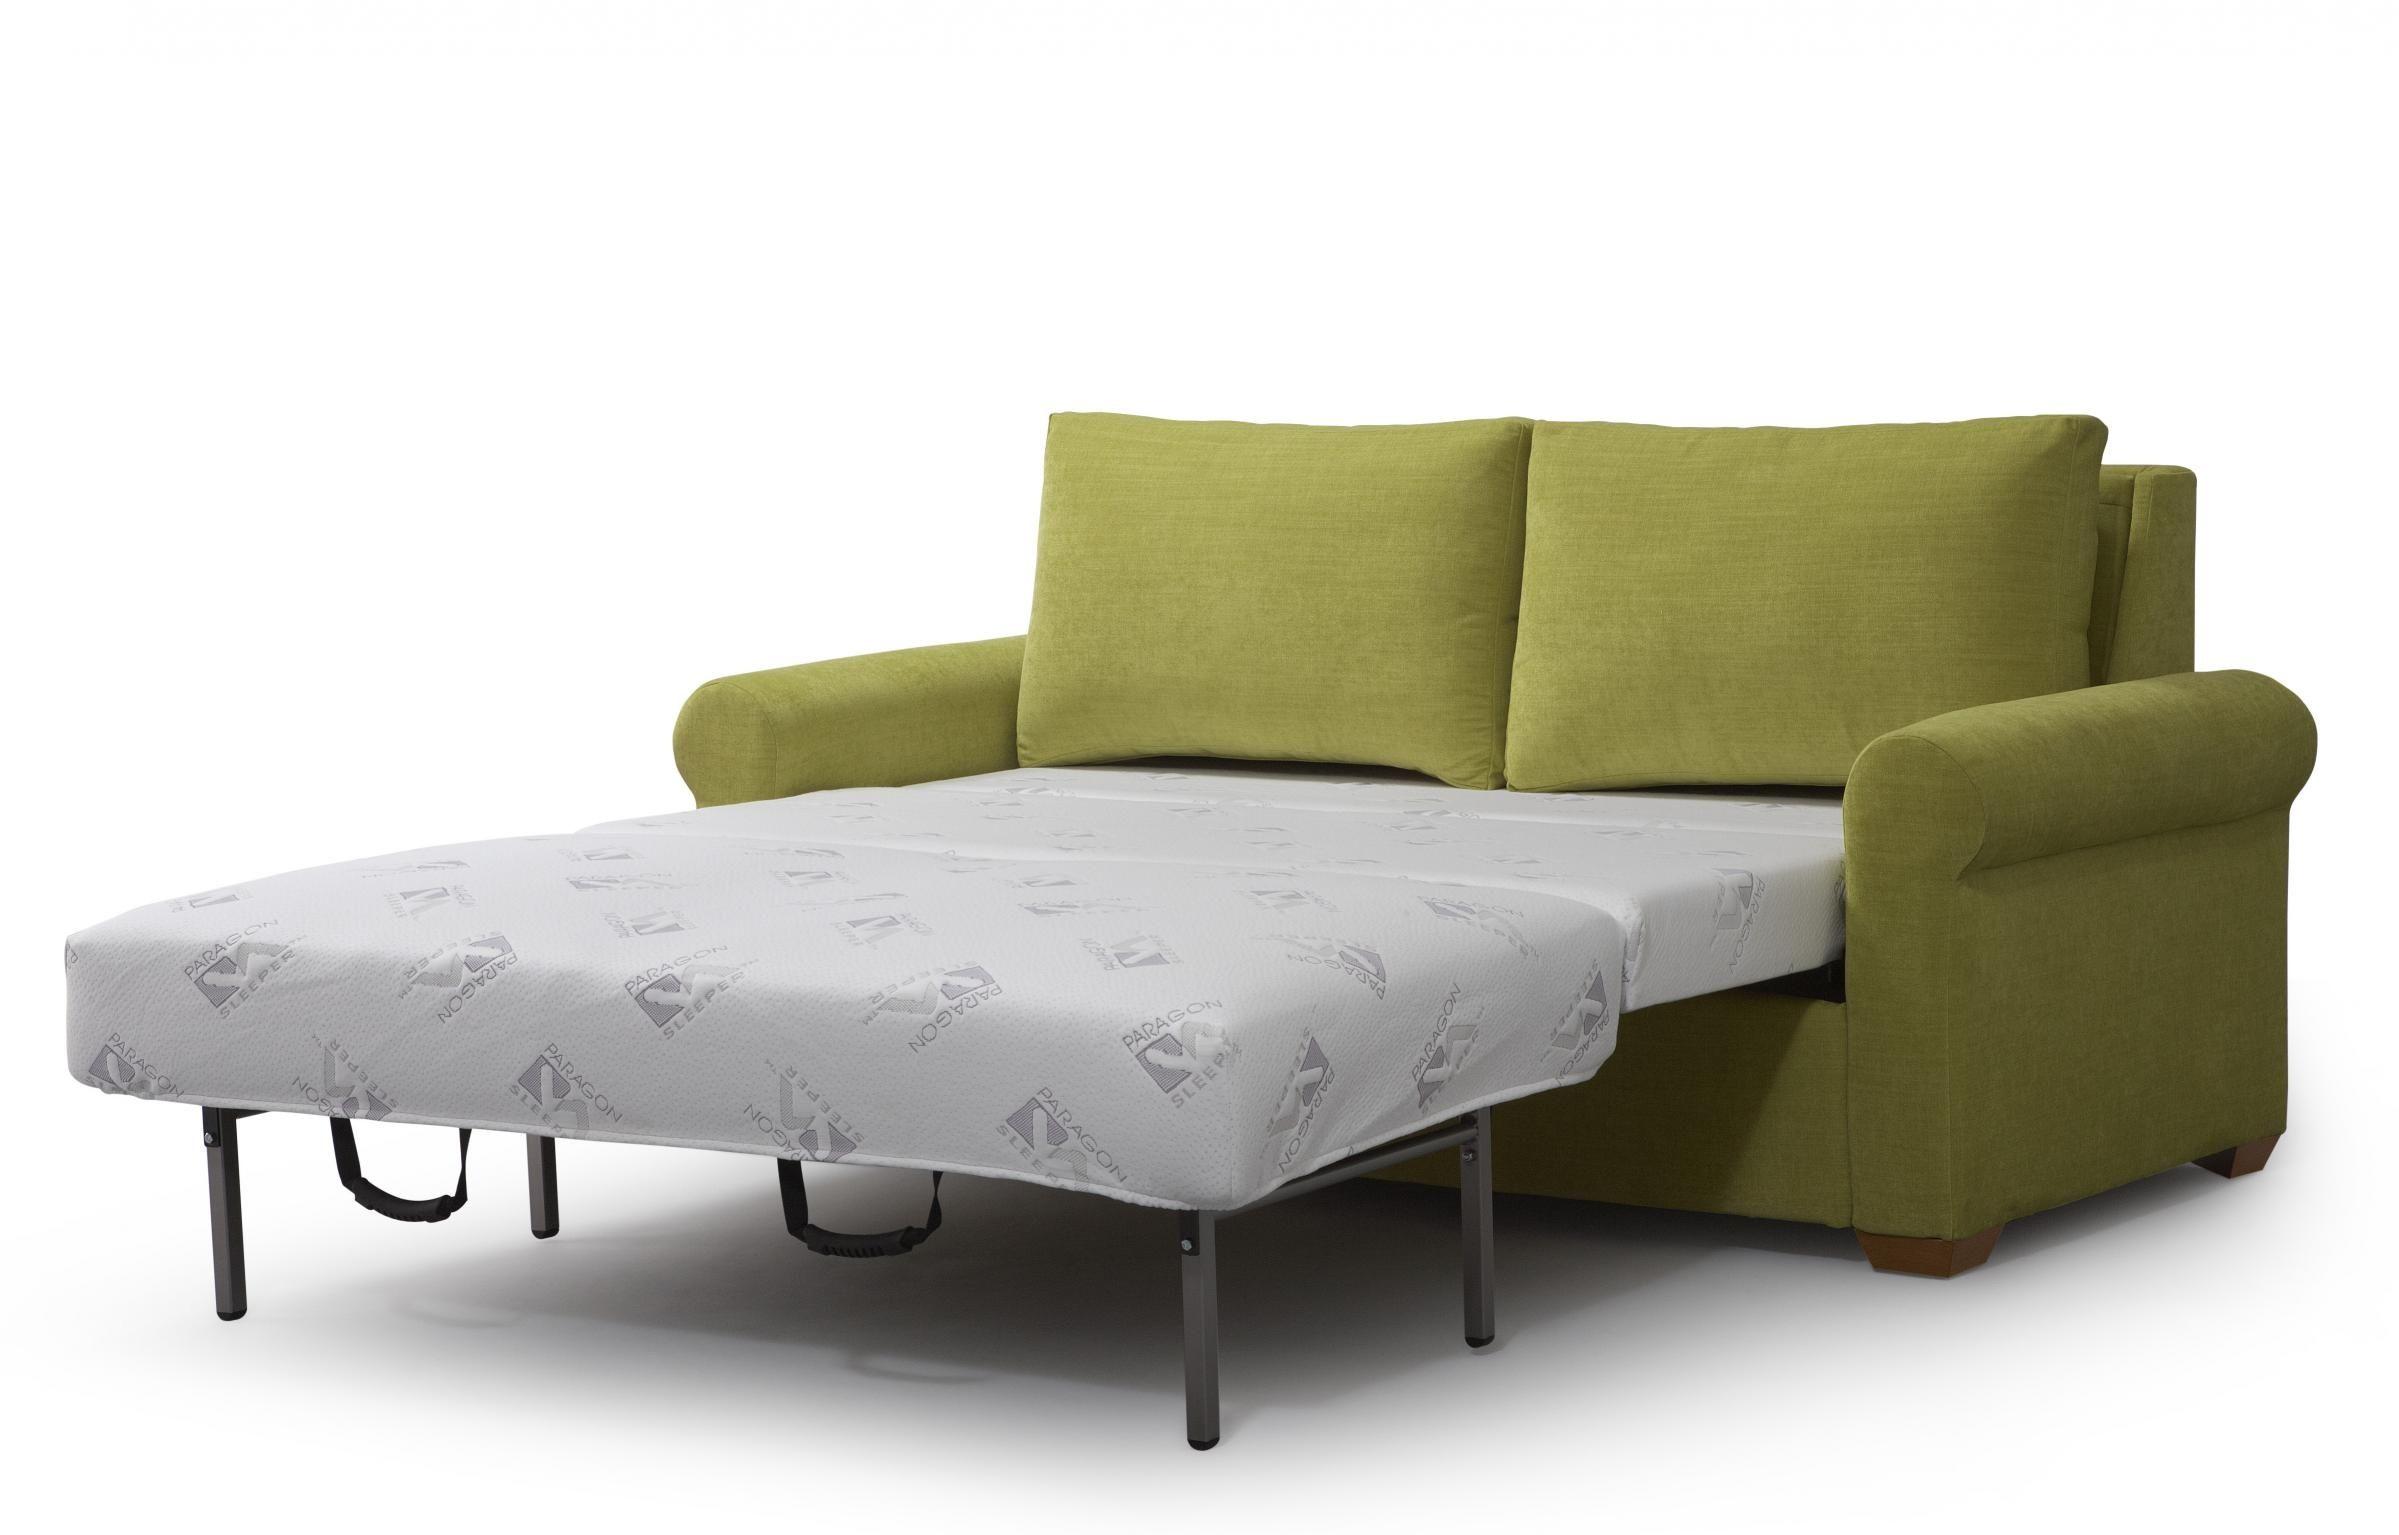 Twin Sleeper Sofa Mattress Pad